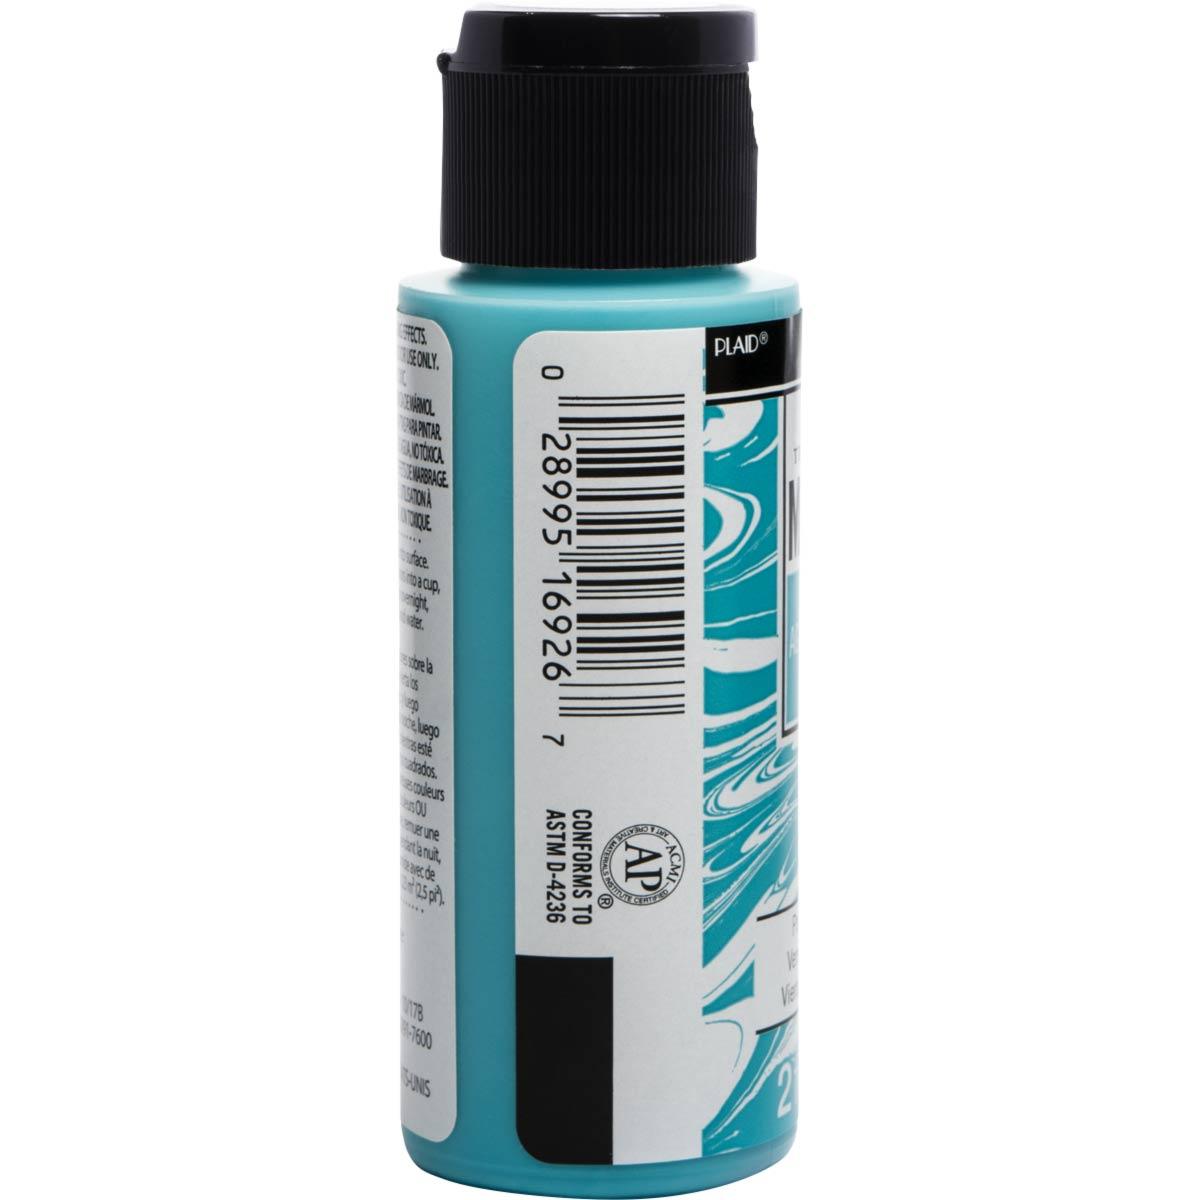 FolkArt ® Marbling Paint - Aqua, 2 oz.